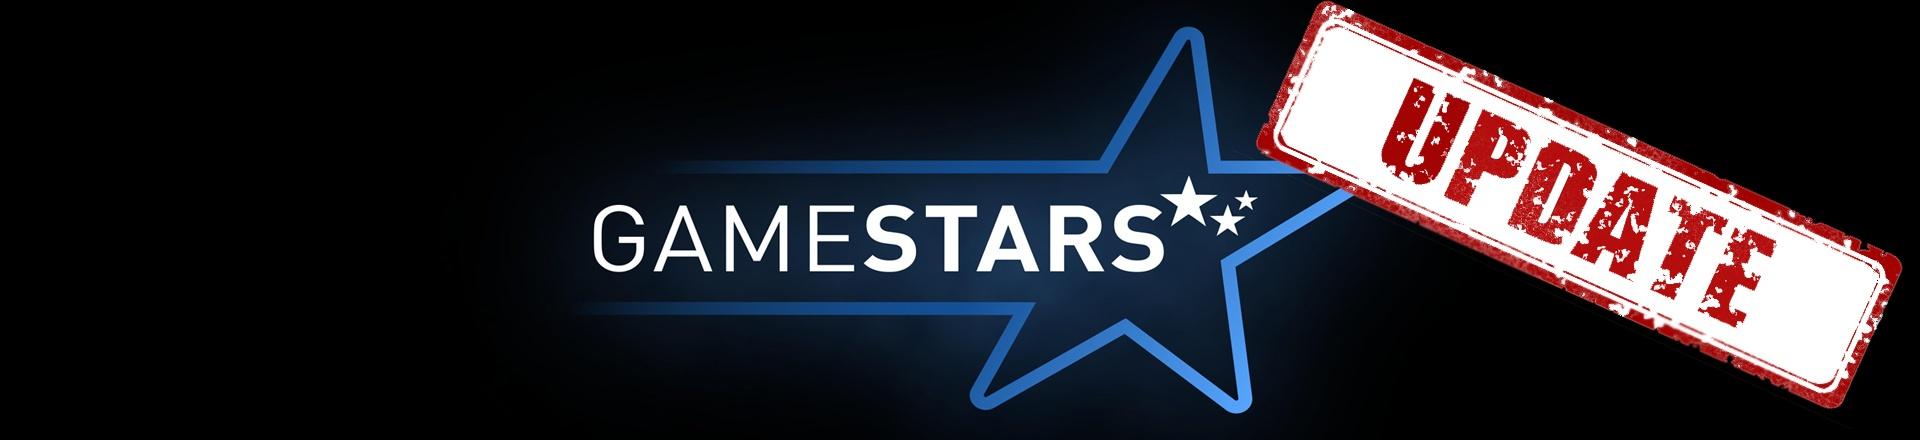 GameStars 2019 Update